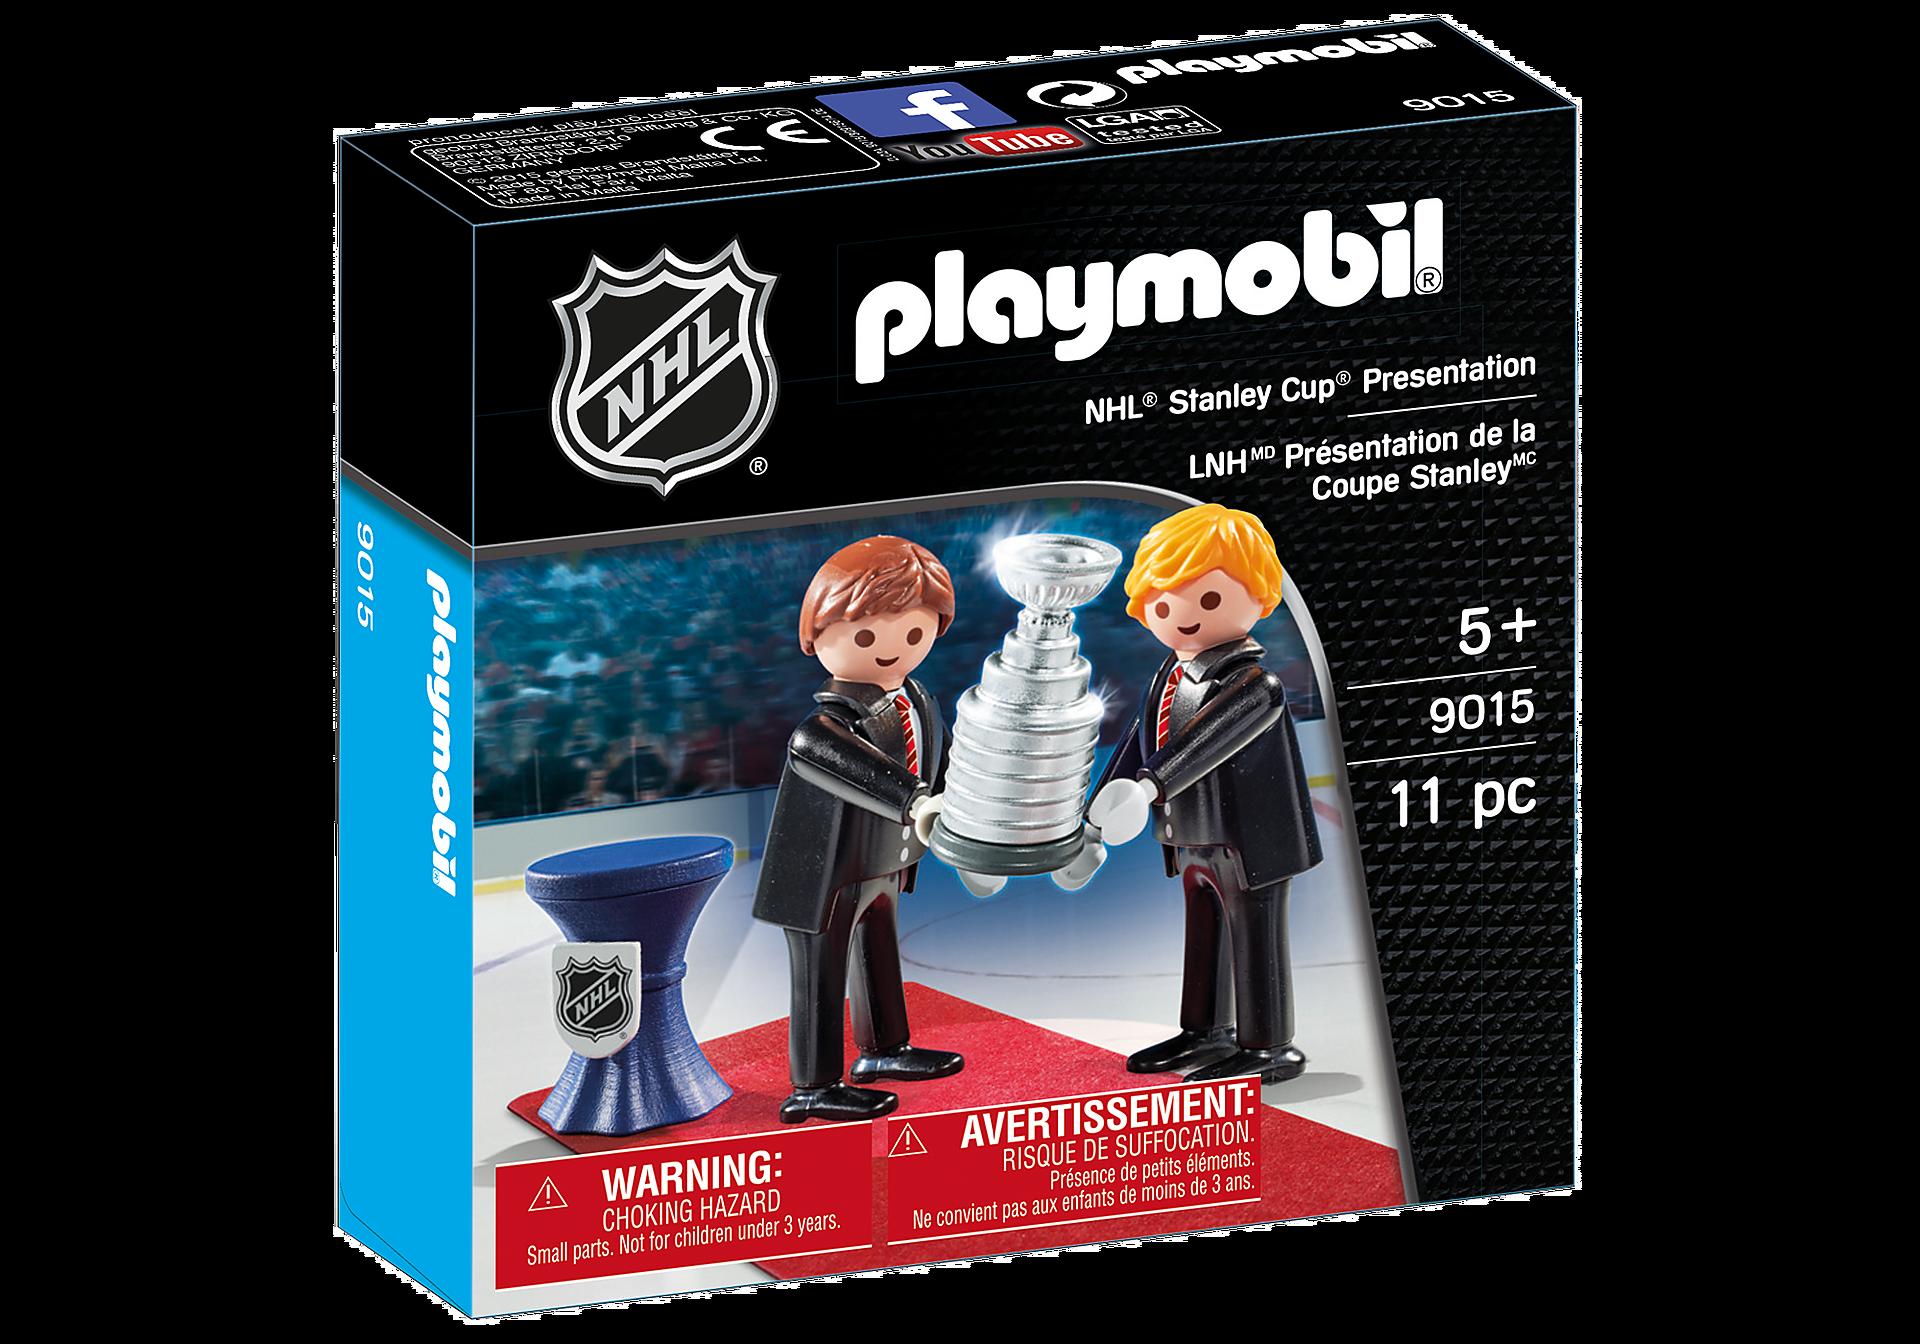 http://media.playmobil.com/i/playmobil/9015_product_box_front/NHL® Stanley Cup® presentation set